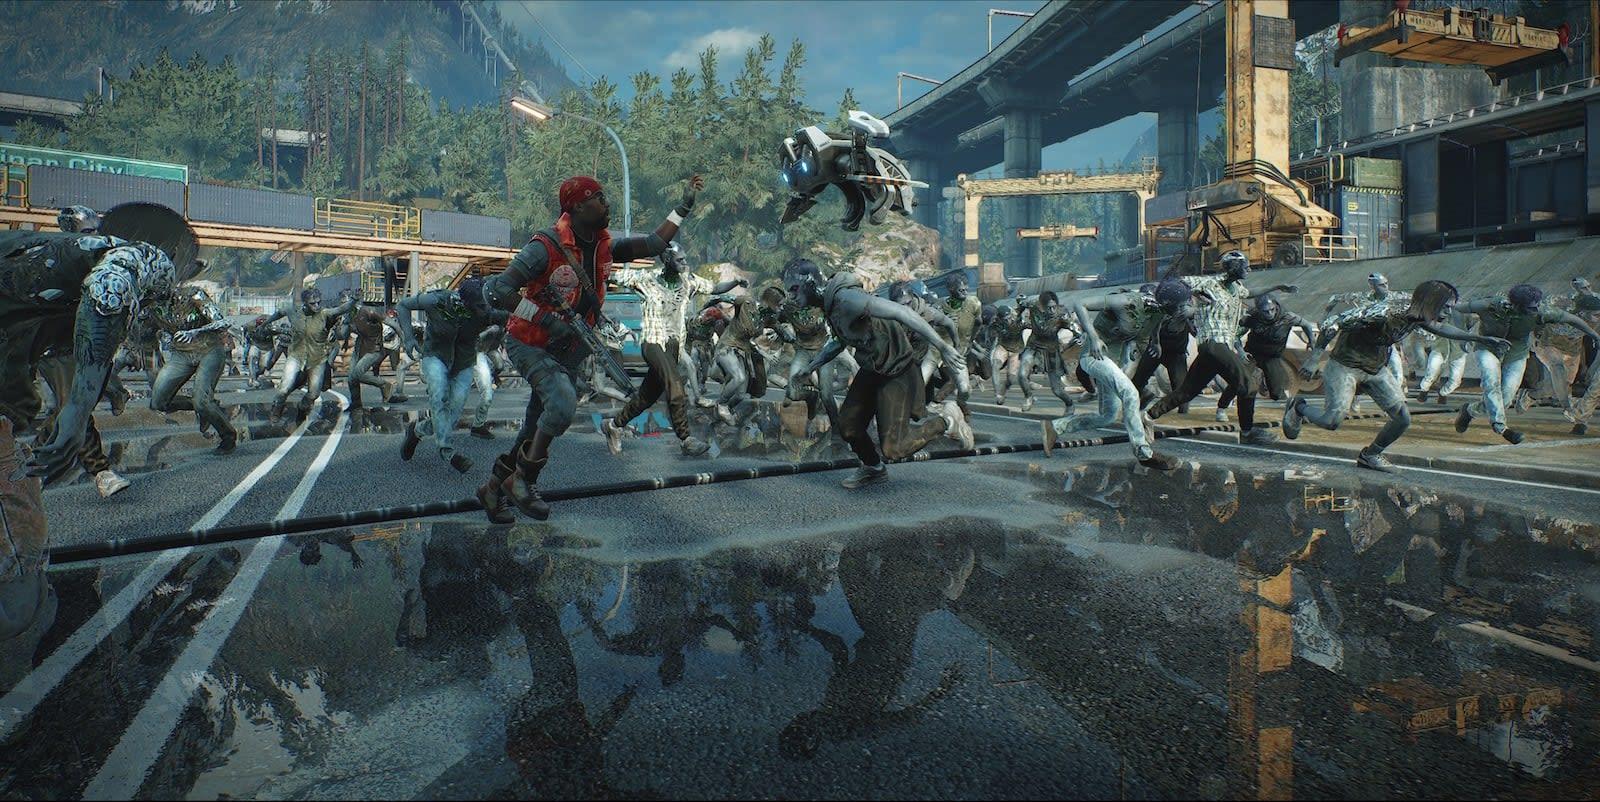 Tencent's own battle royale game has hackable zombies